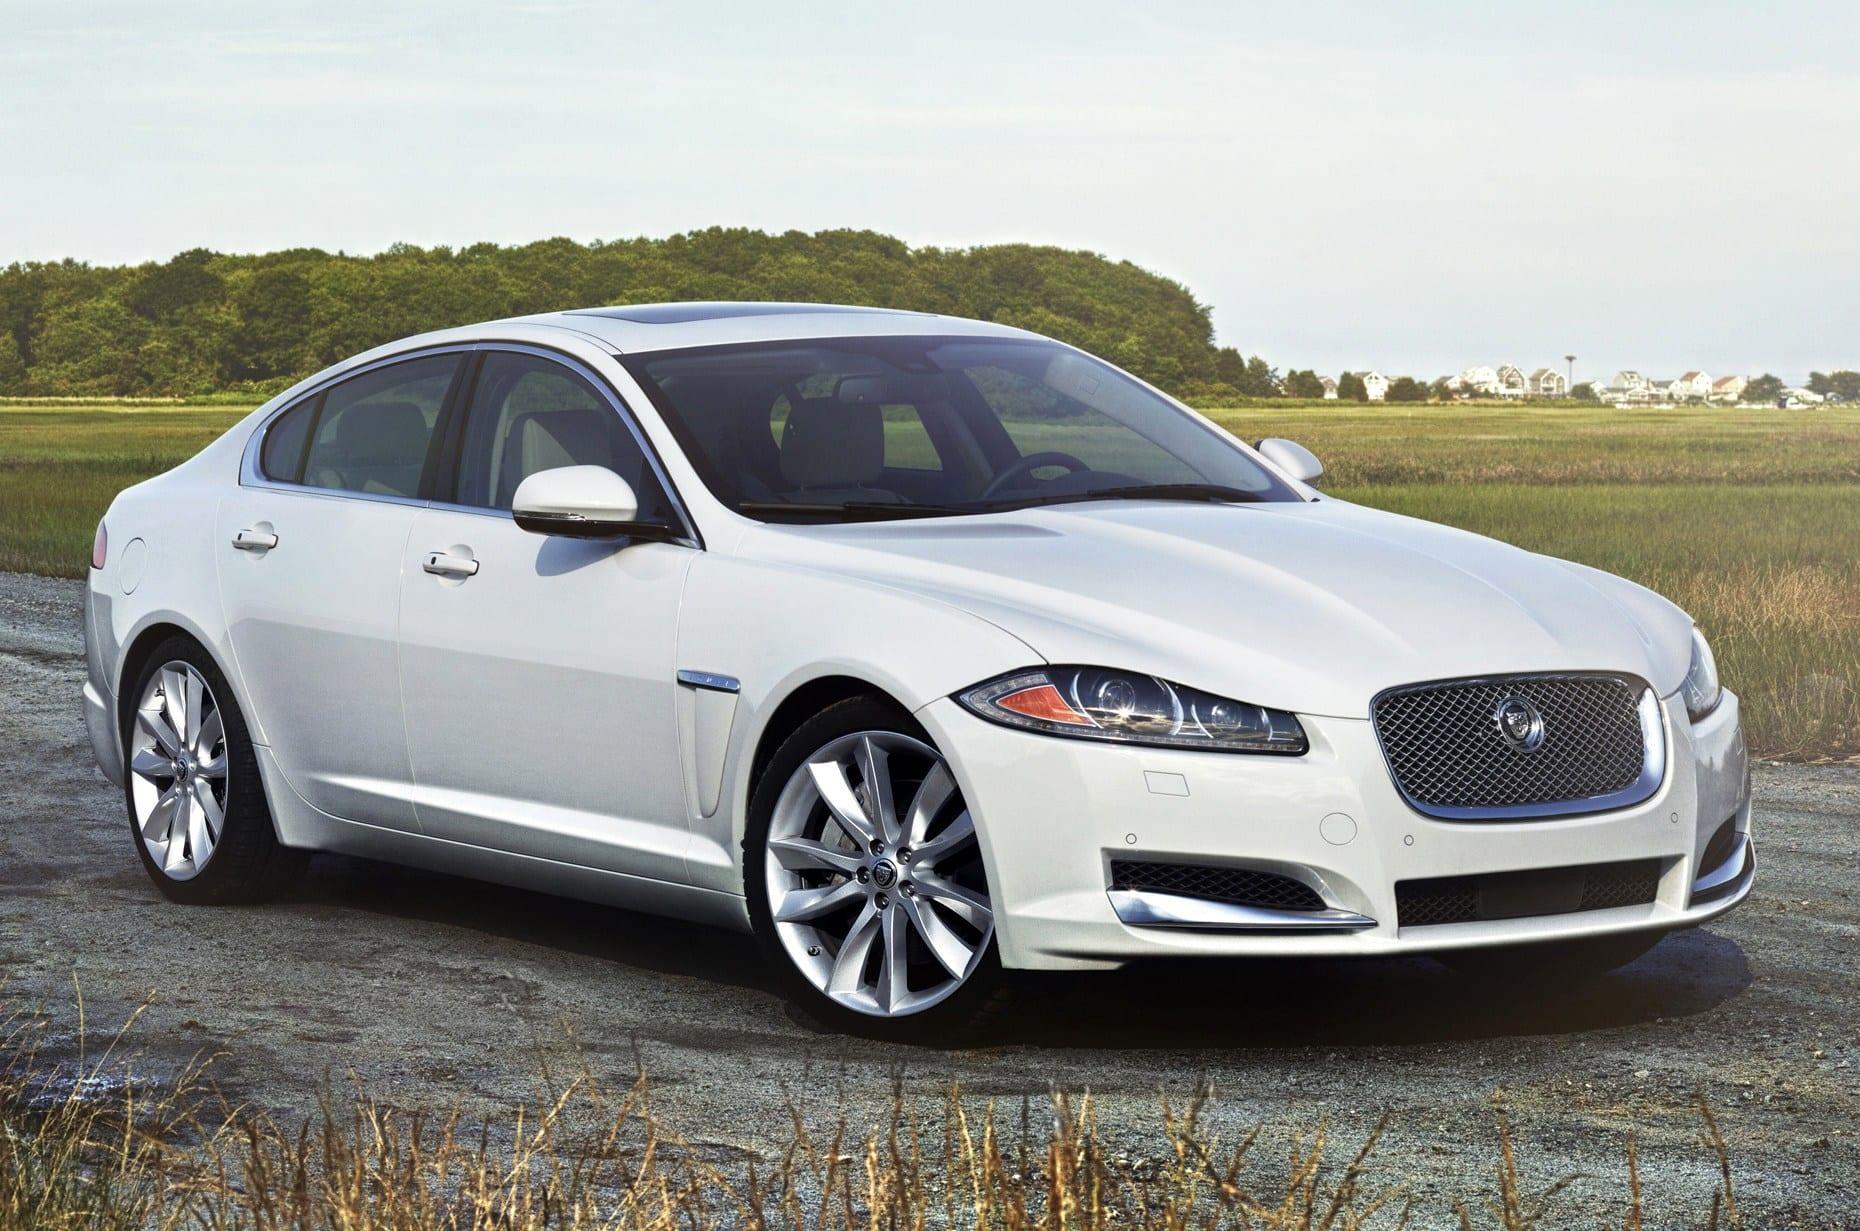 Novo recall anunciado para o Jaguar XF